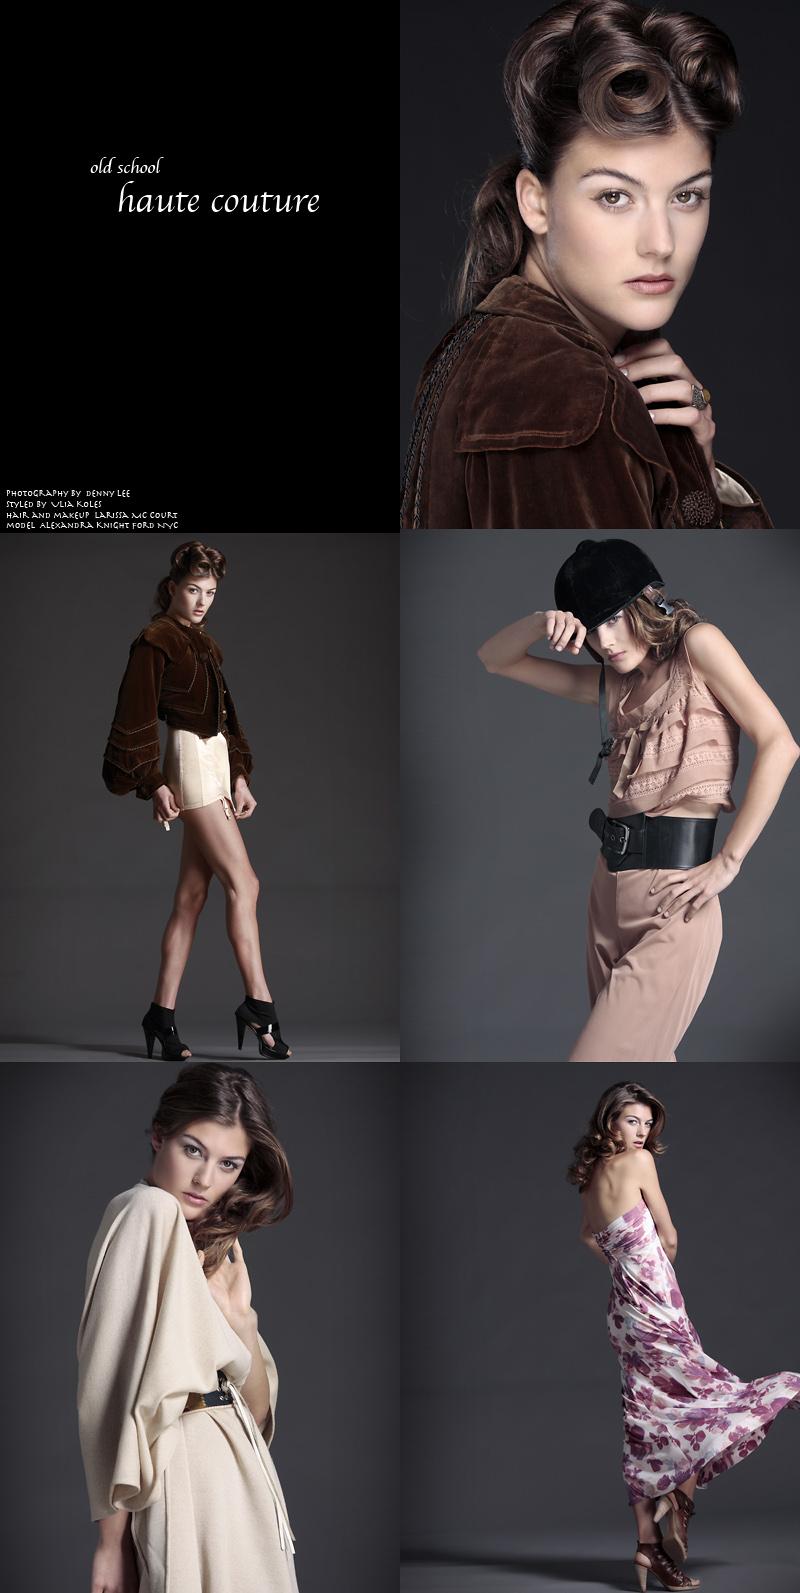 artcube Mar 05, 2010 dennyleephotography.com model Alexandra Knight for FORD NYC